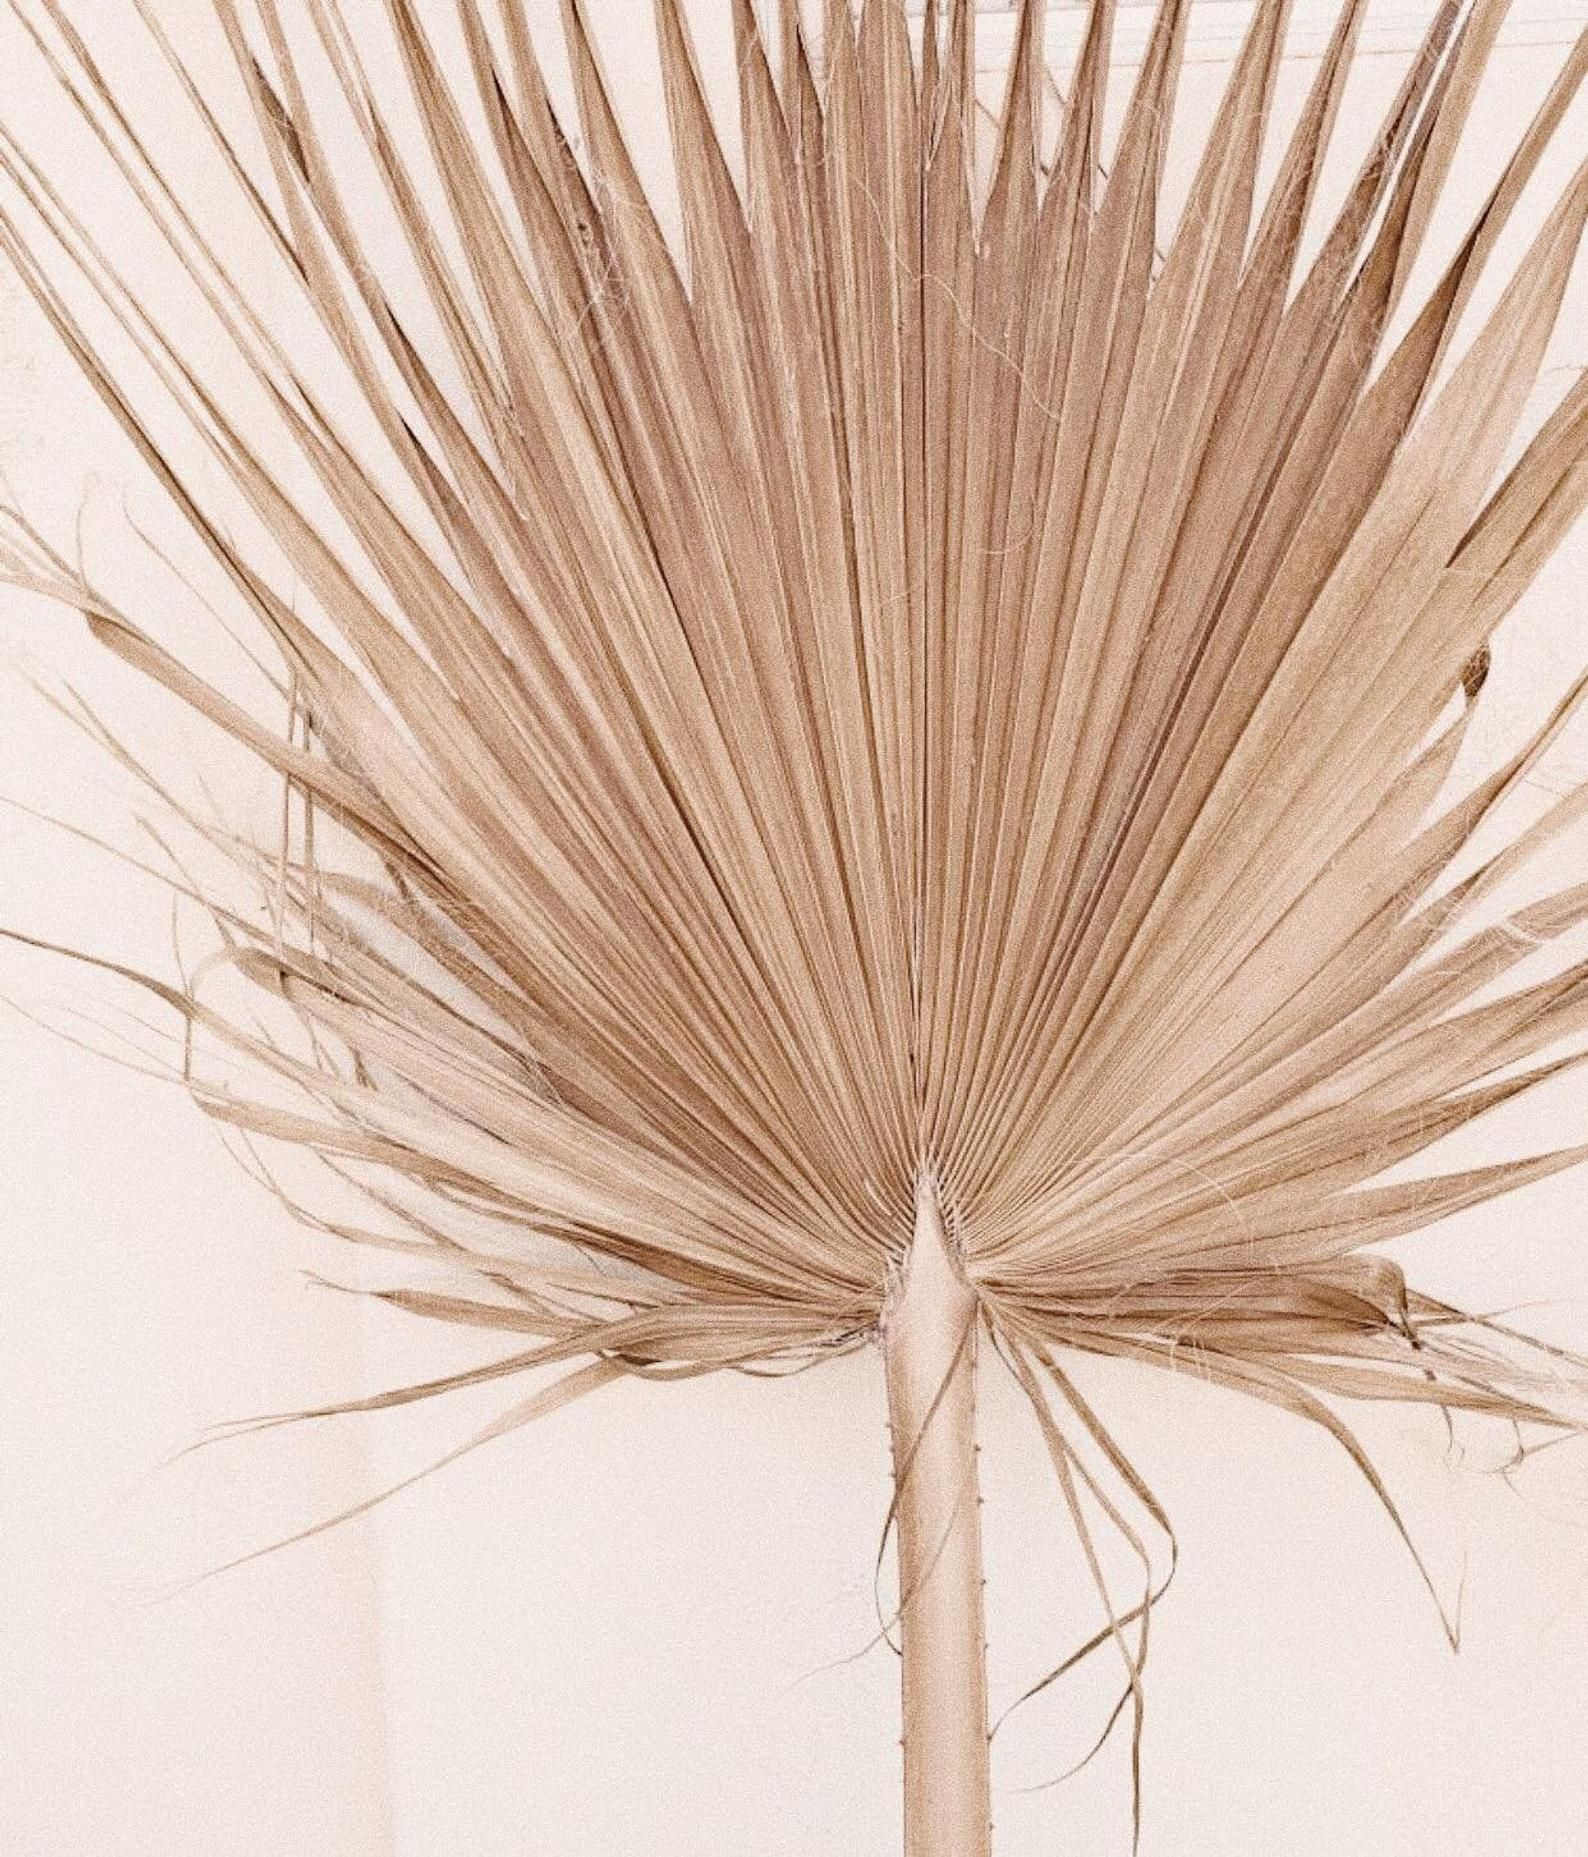 Giant Sun Dried Fan Palm Giant Home Decor Tropical Decor Wall Decor Palm Dried Palm Leaf Fan Palm Large Vases Decor Tropical Decor